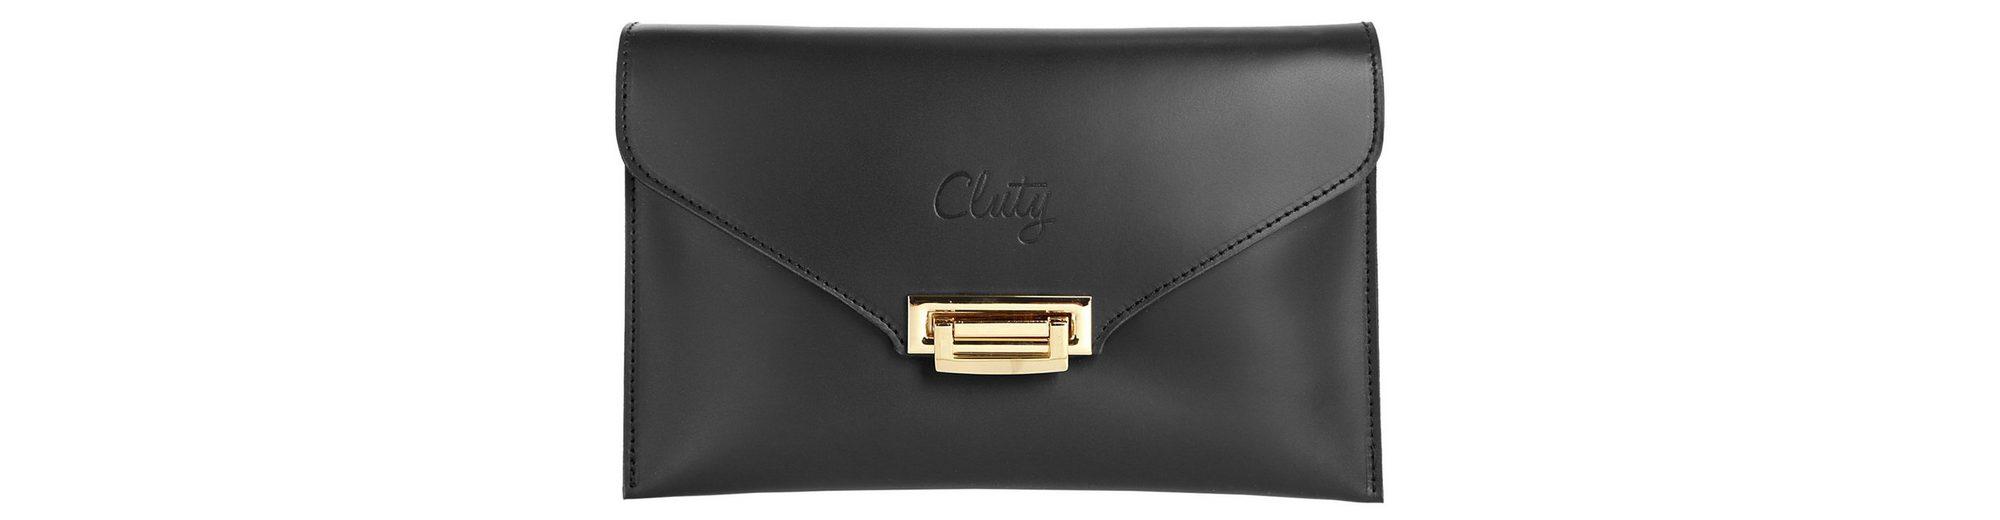 Cluty Abendtasche / Clutch